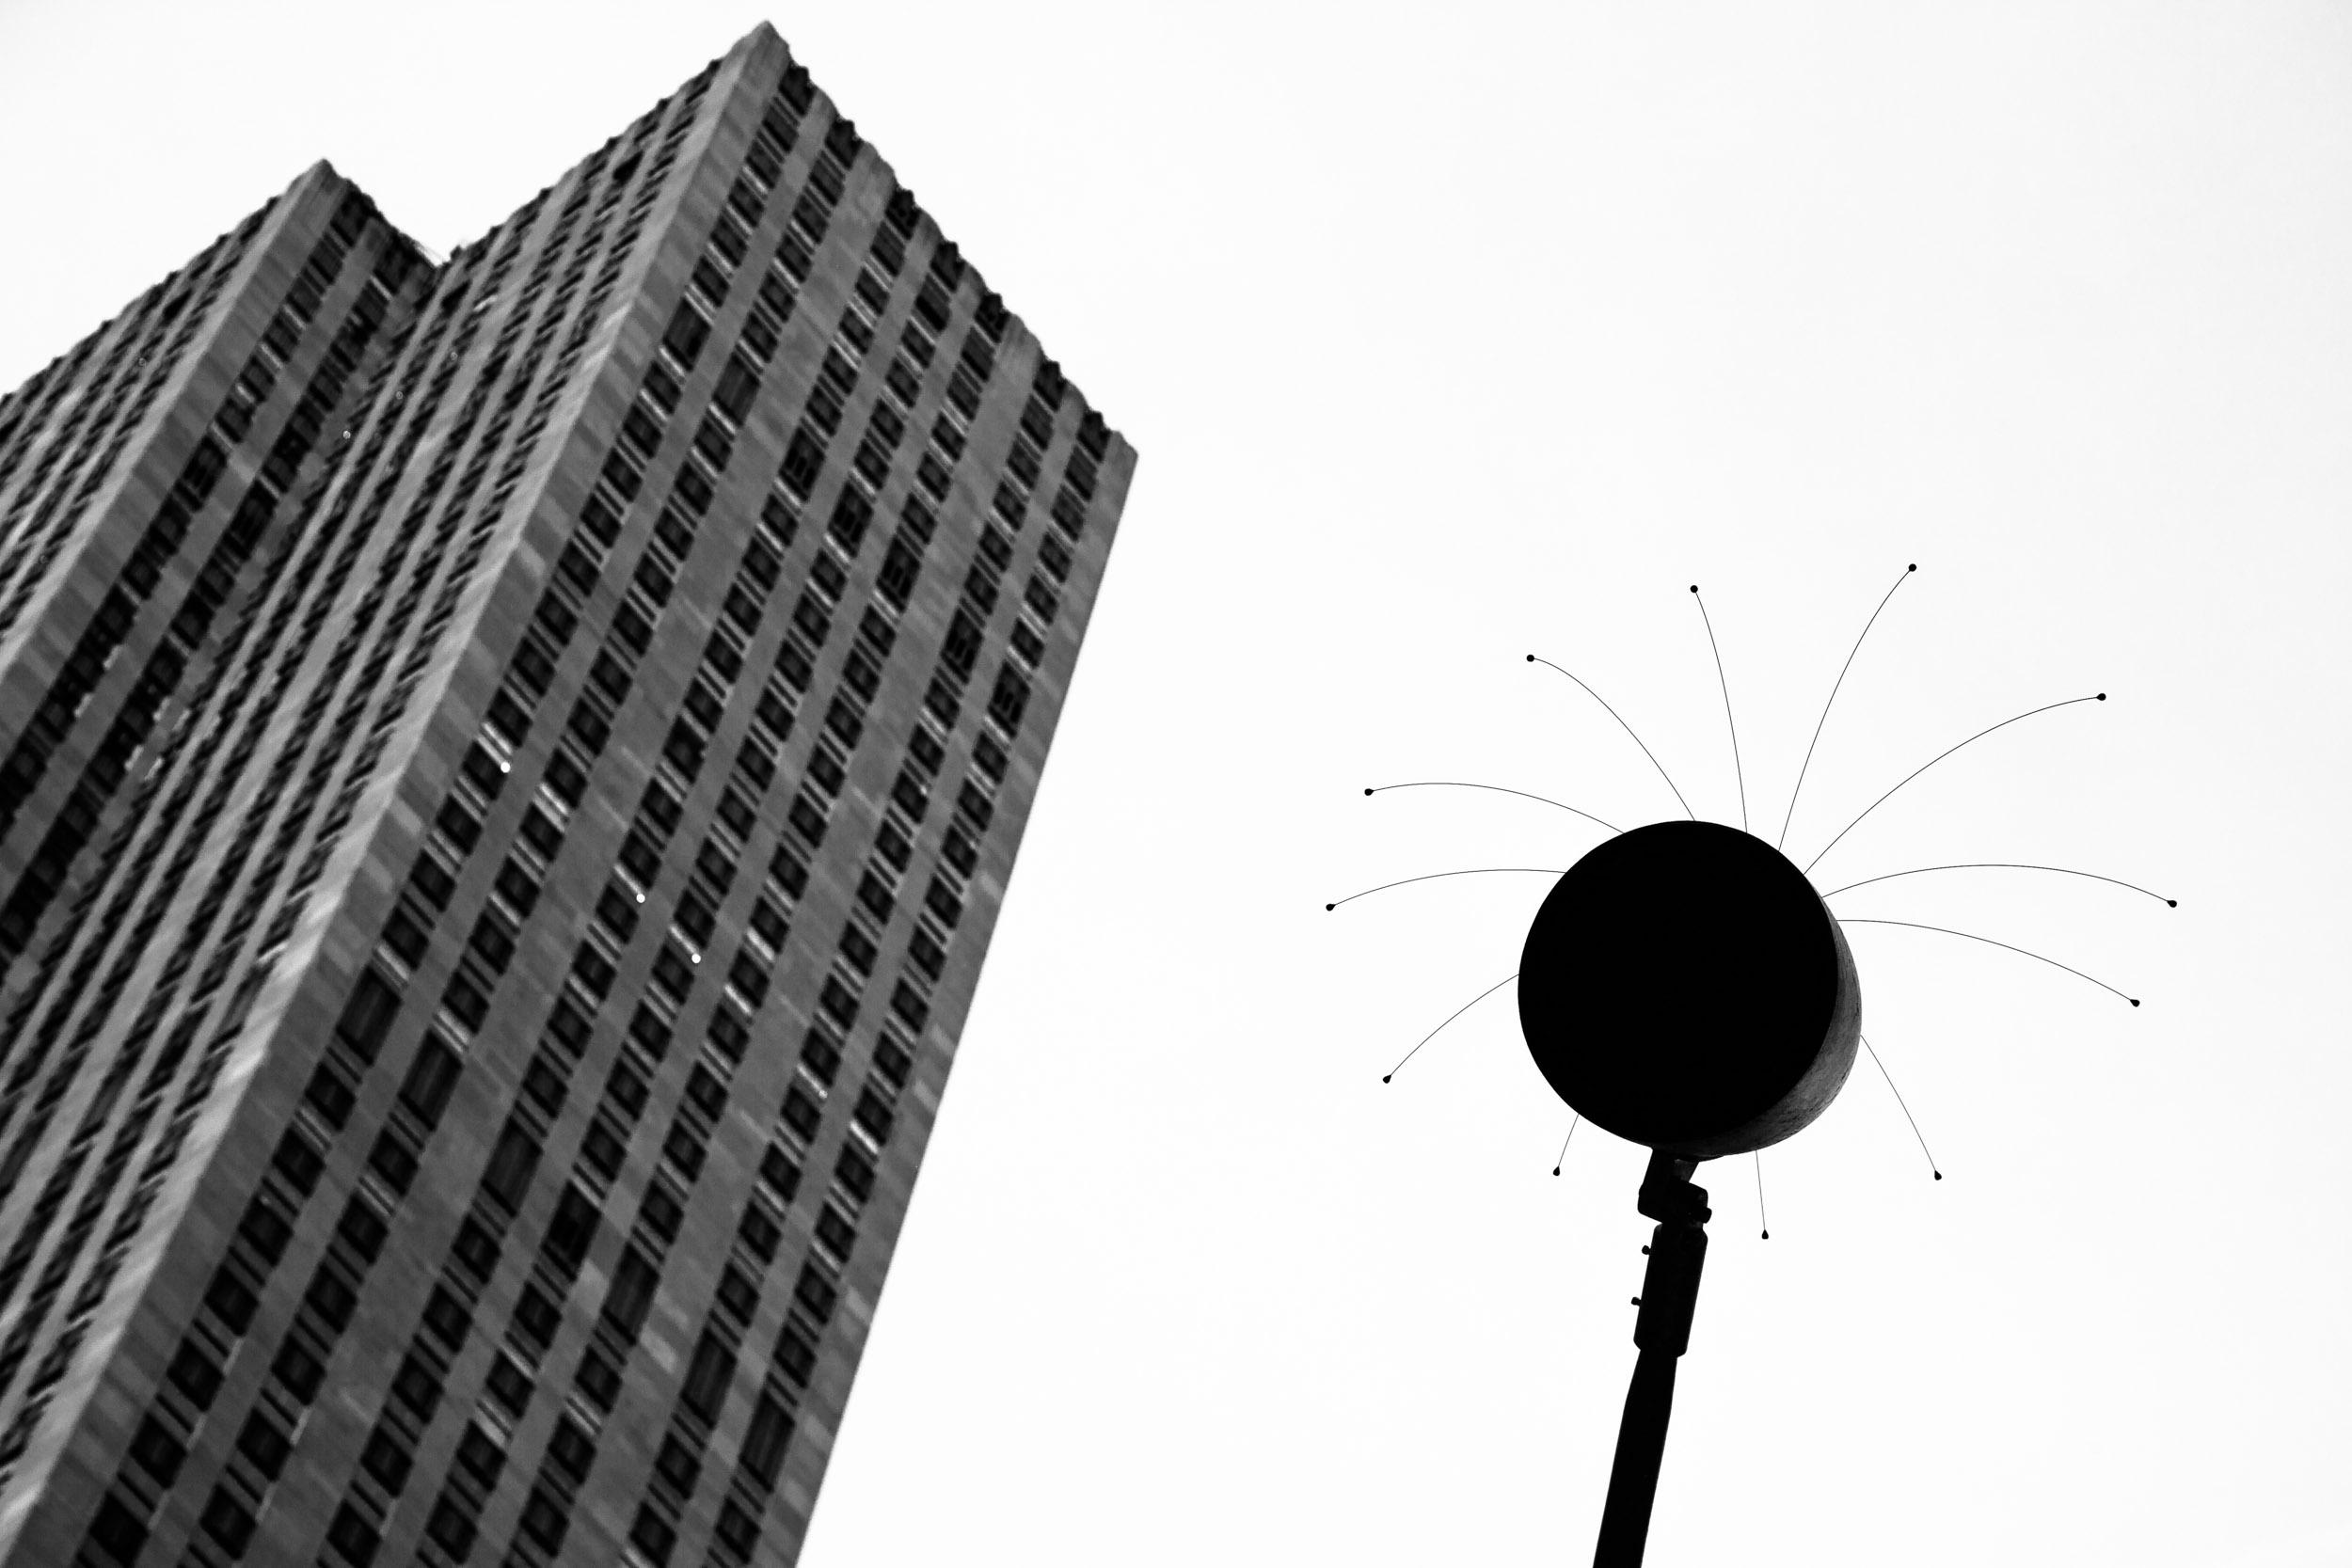 Streetlights of New York #25 New York, NY 2010